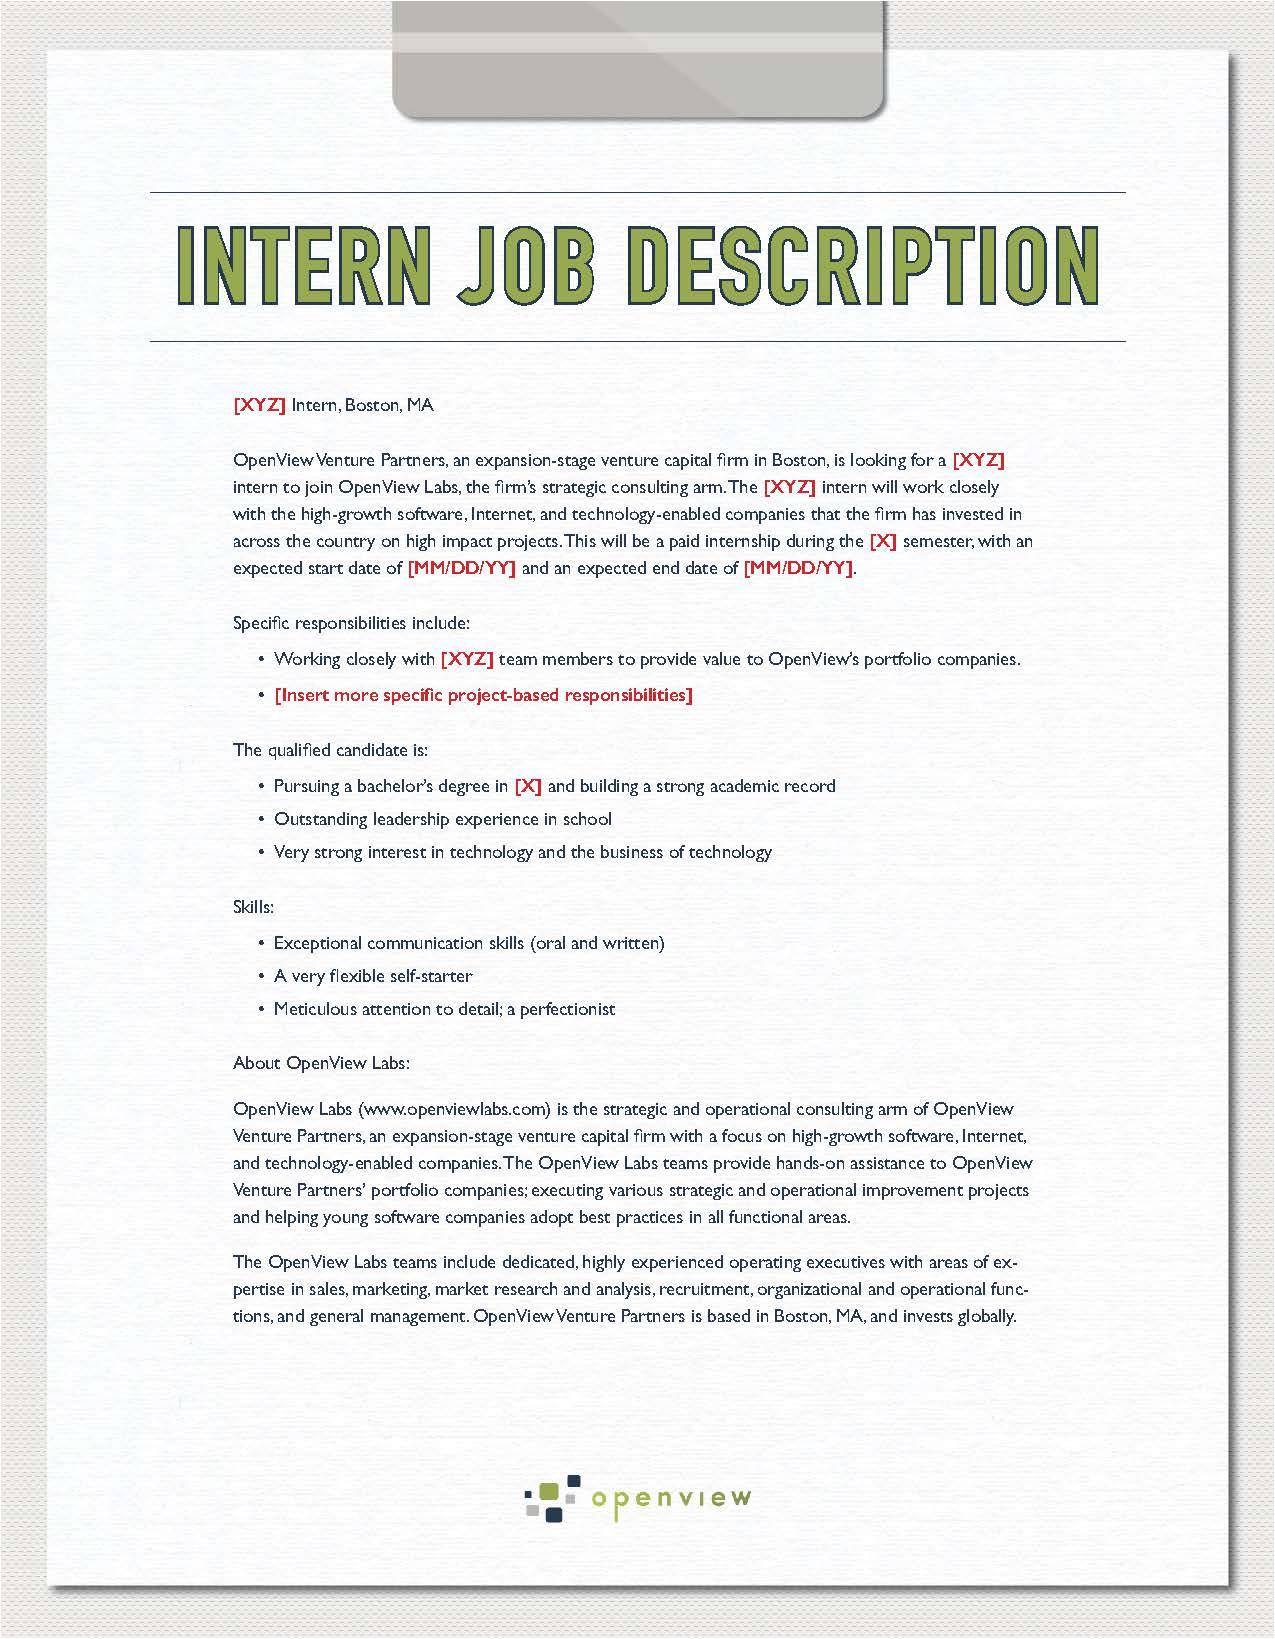 intern job description template